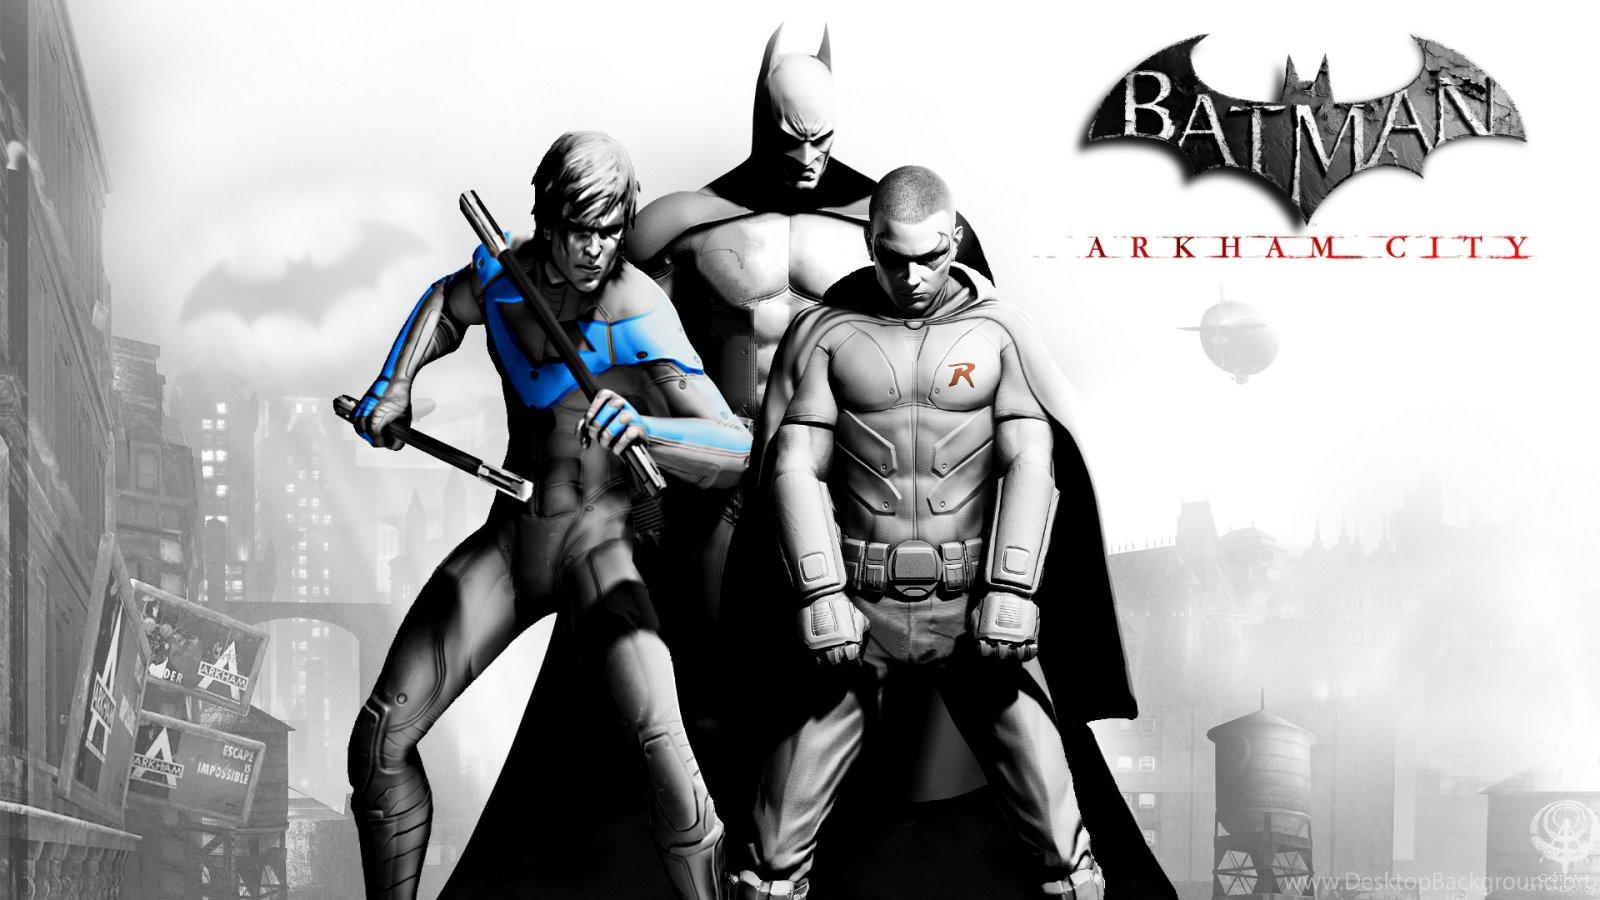 Gallery For Batman Arkham City Nightwing Wallpapers Desktop Background